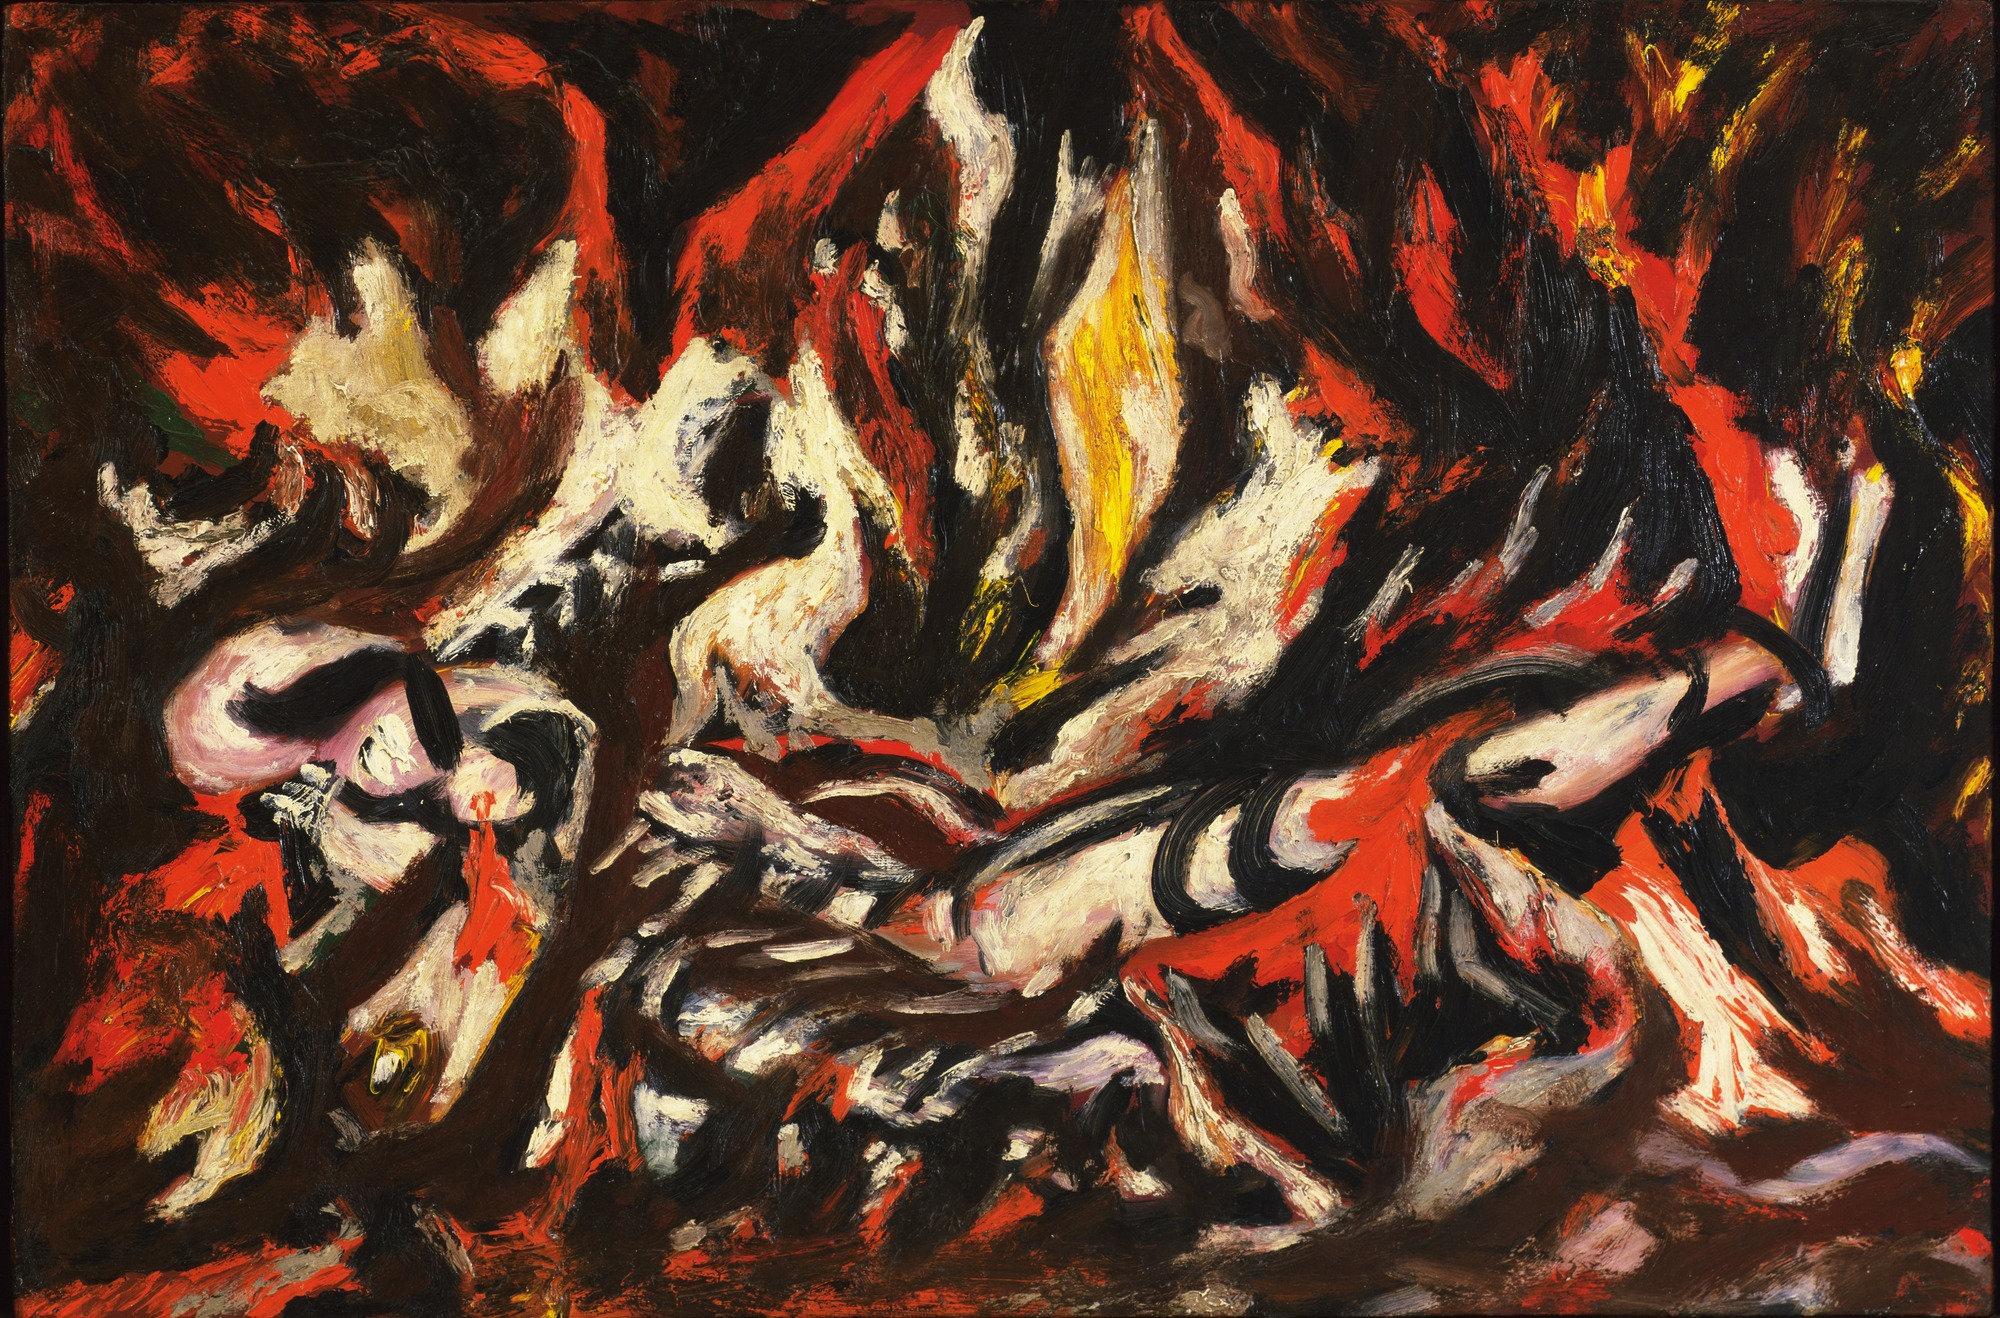 'The Flame' - Jackson Pollock © Moma